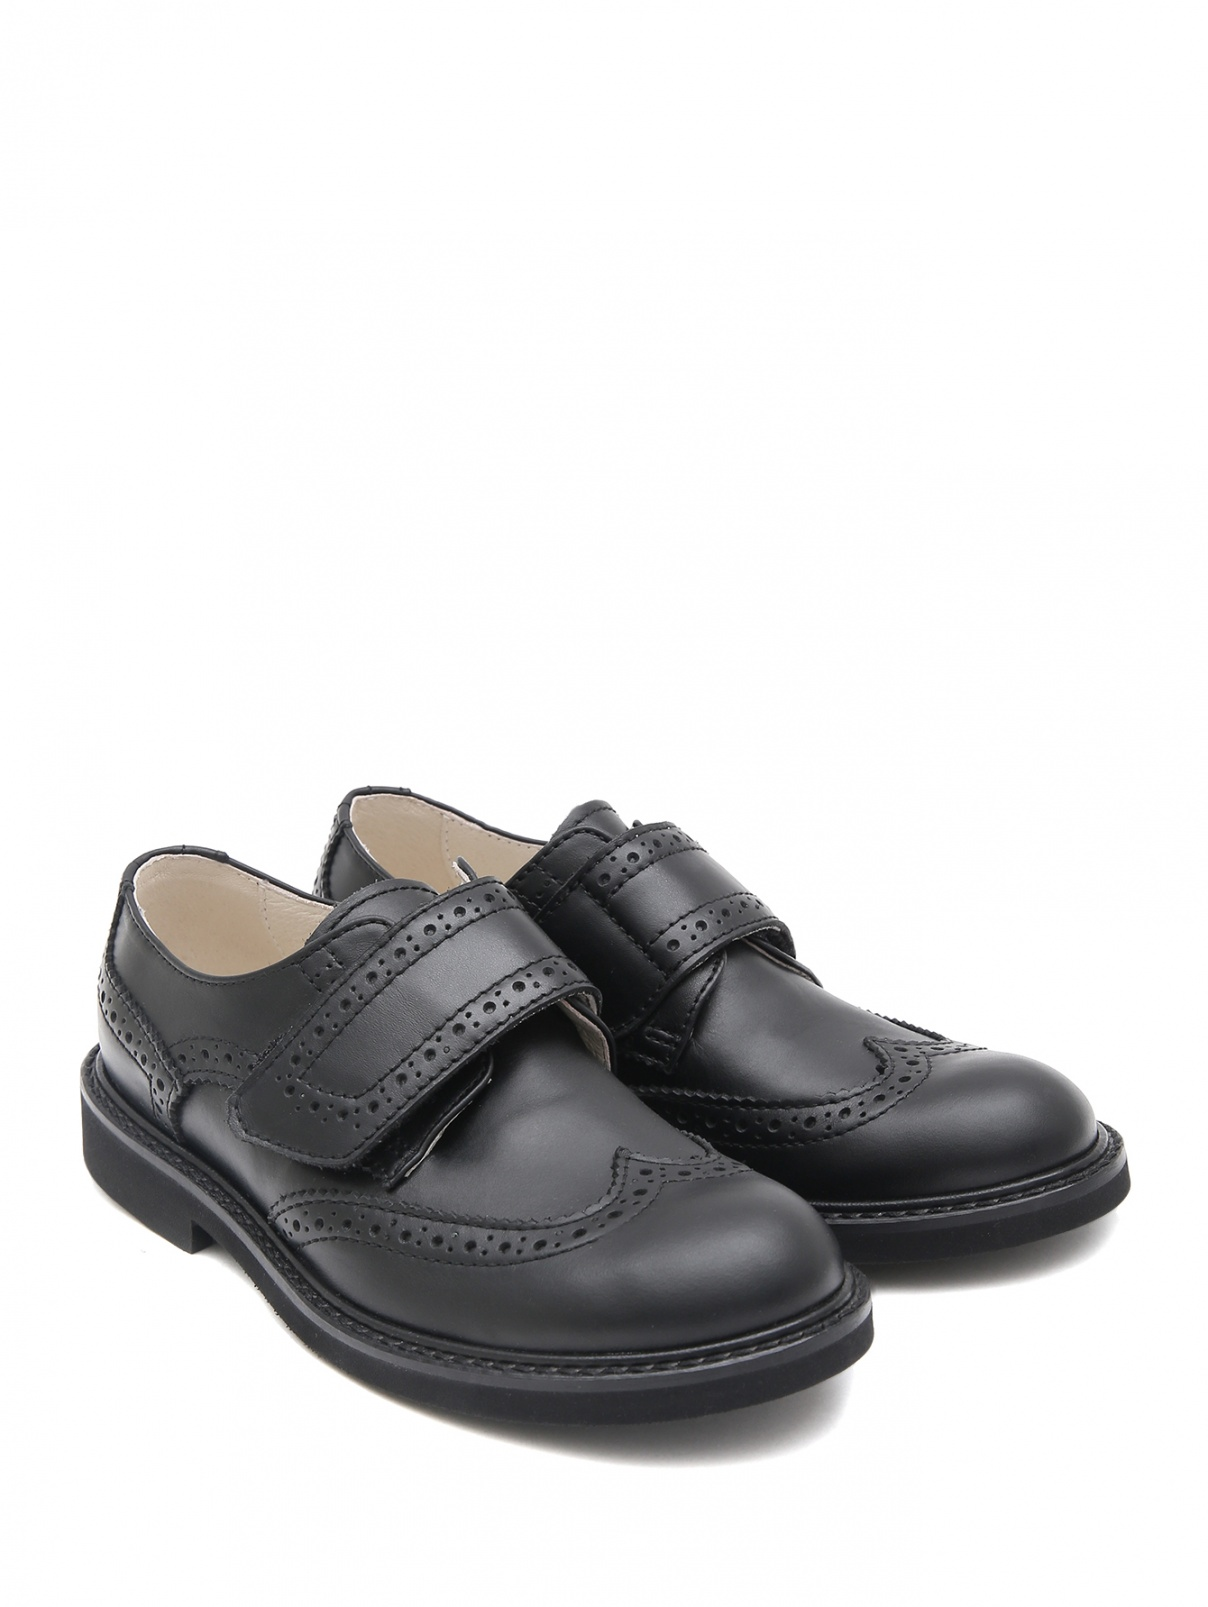 Кожаные туфли на липучке MONTELPARE TRADITION  –  Общий вид